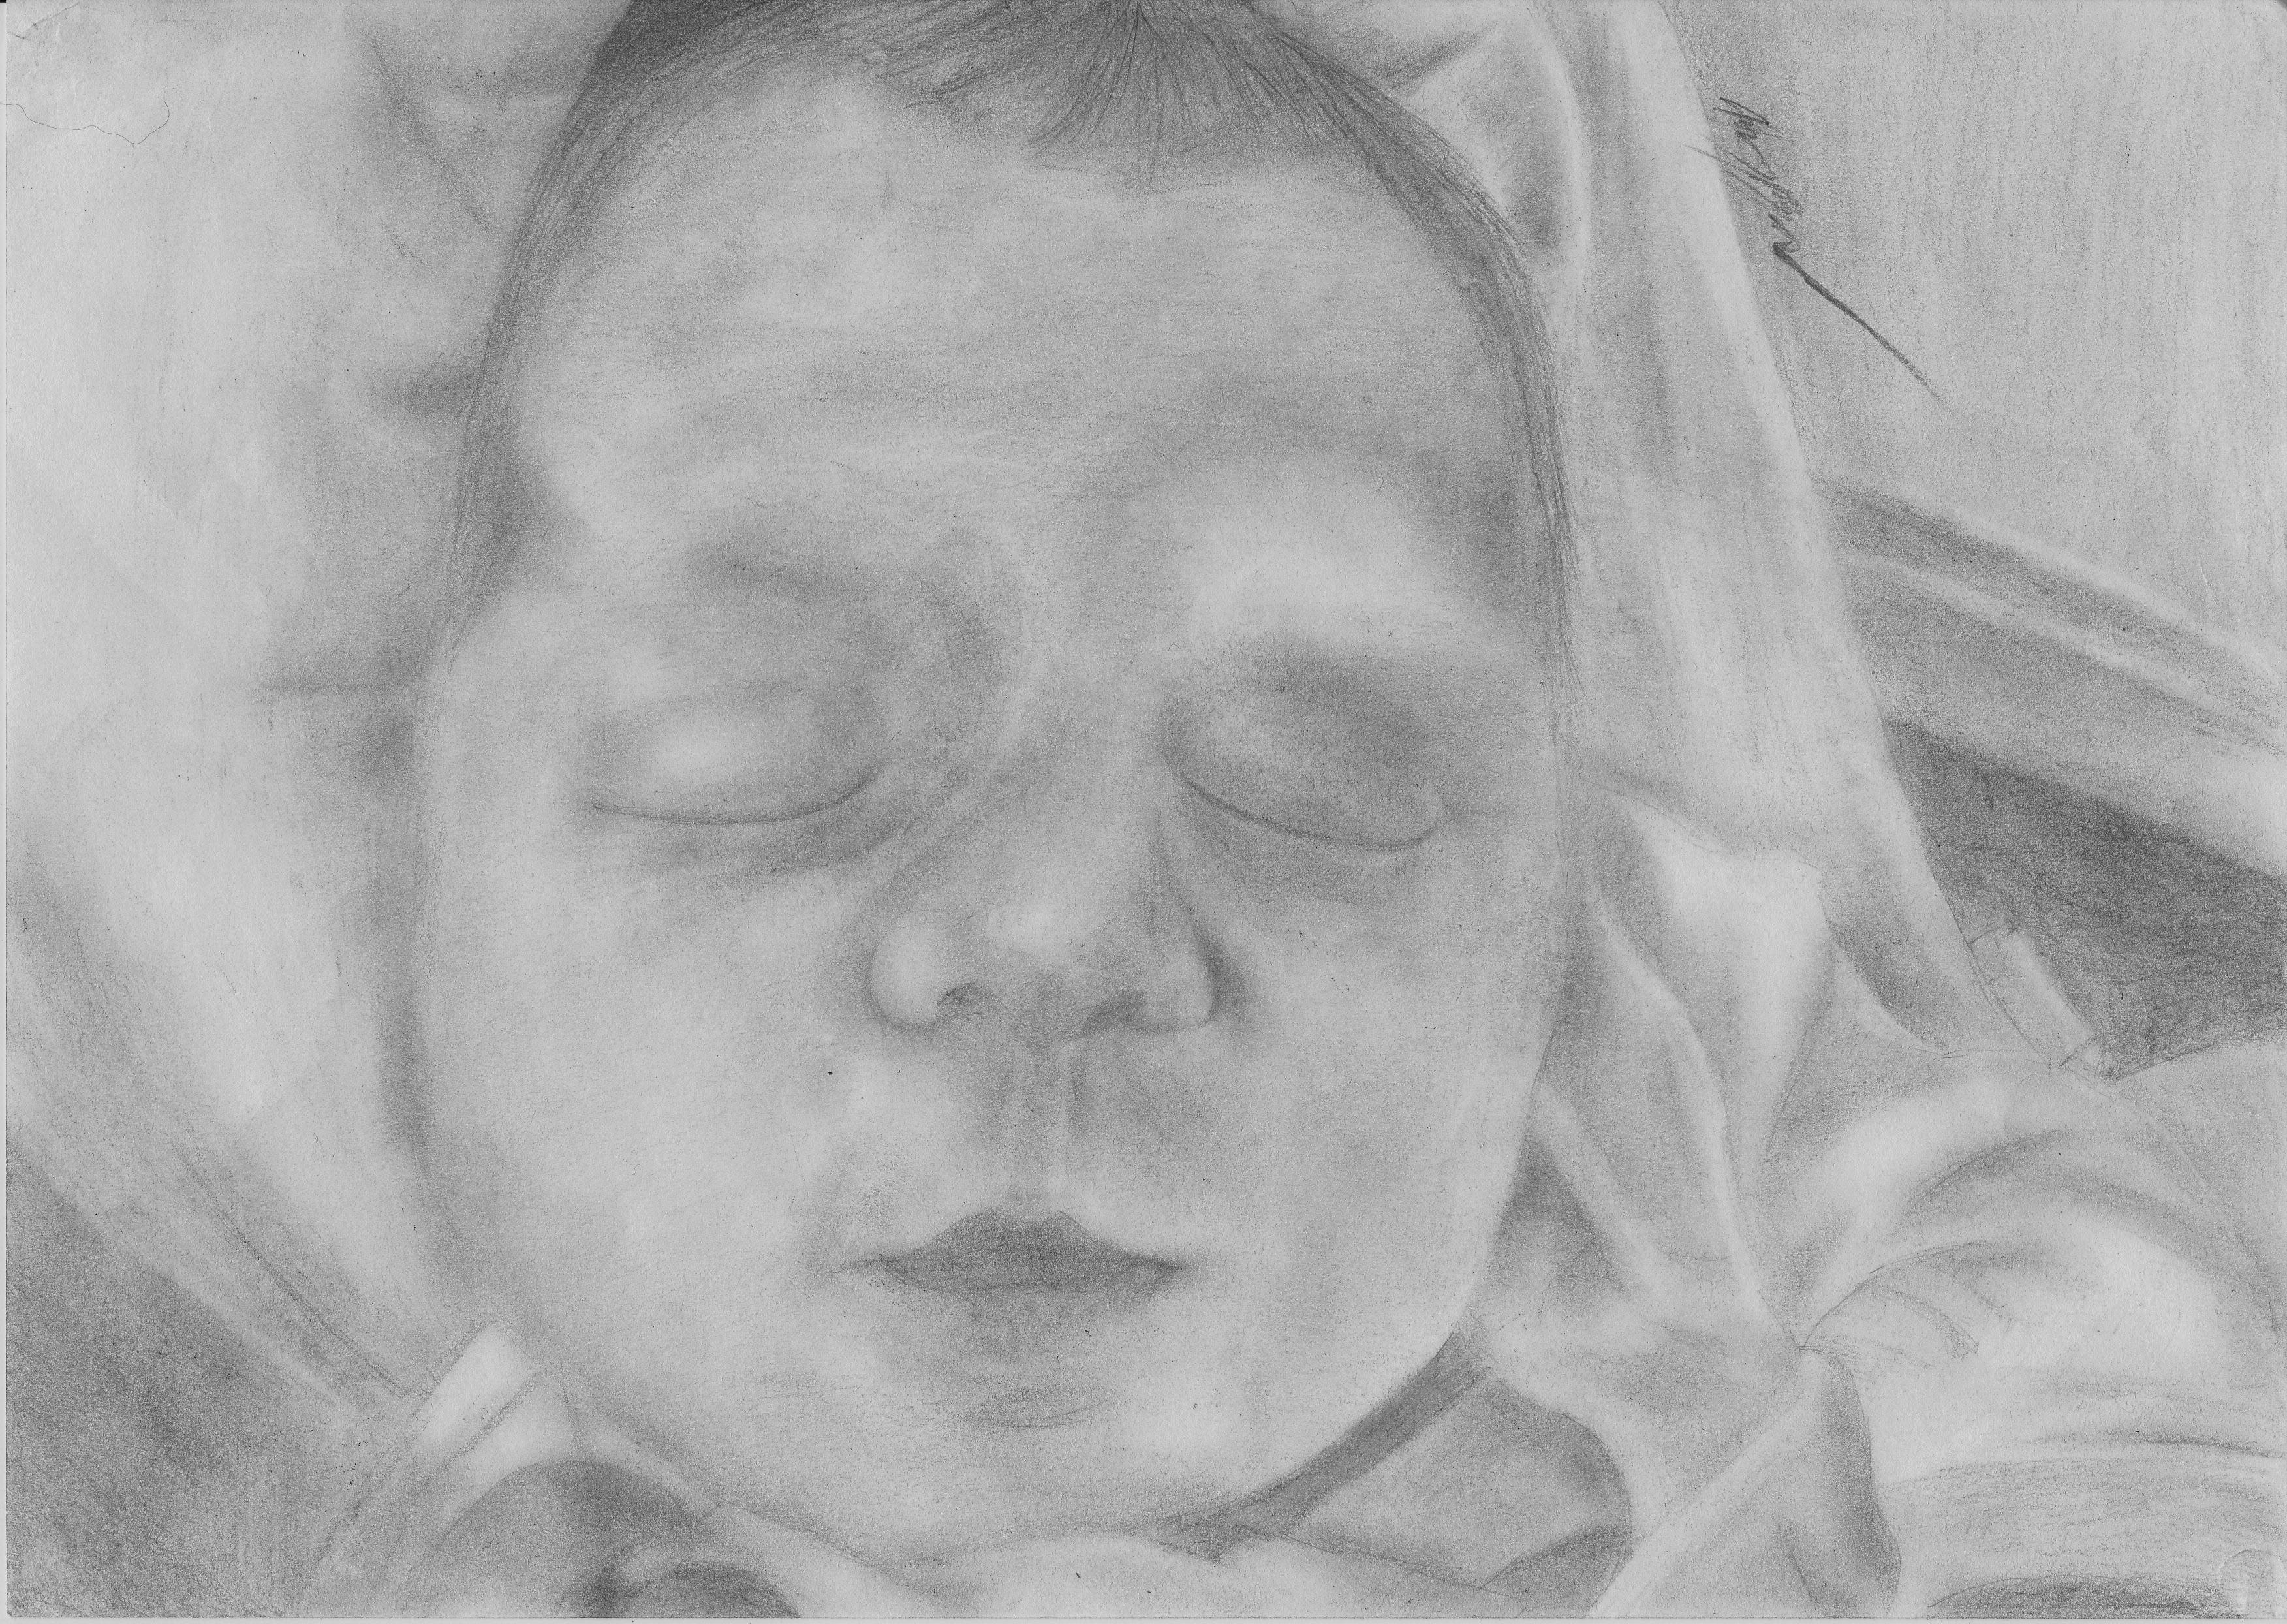 Baby Skyla Commission by SalvainKarnan